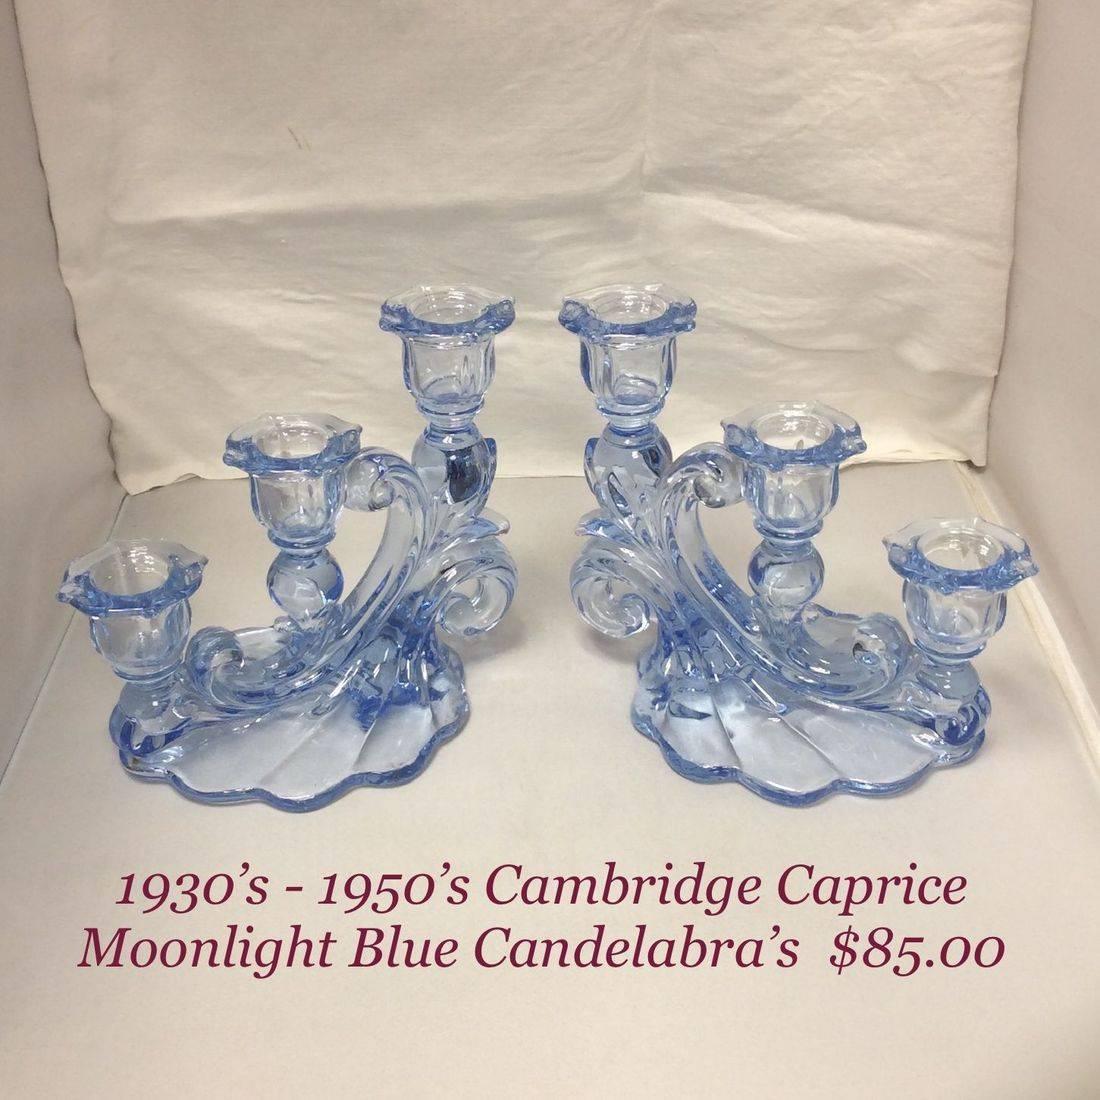 1930's-1950's Pr. Cambridge Caprice Moonlight Blue Candelabras   $85.00